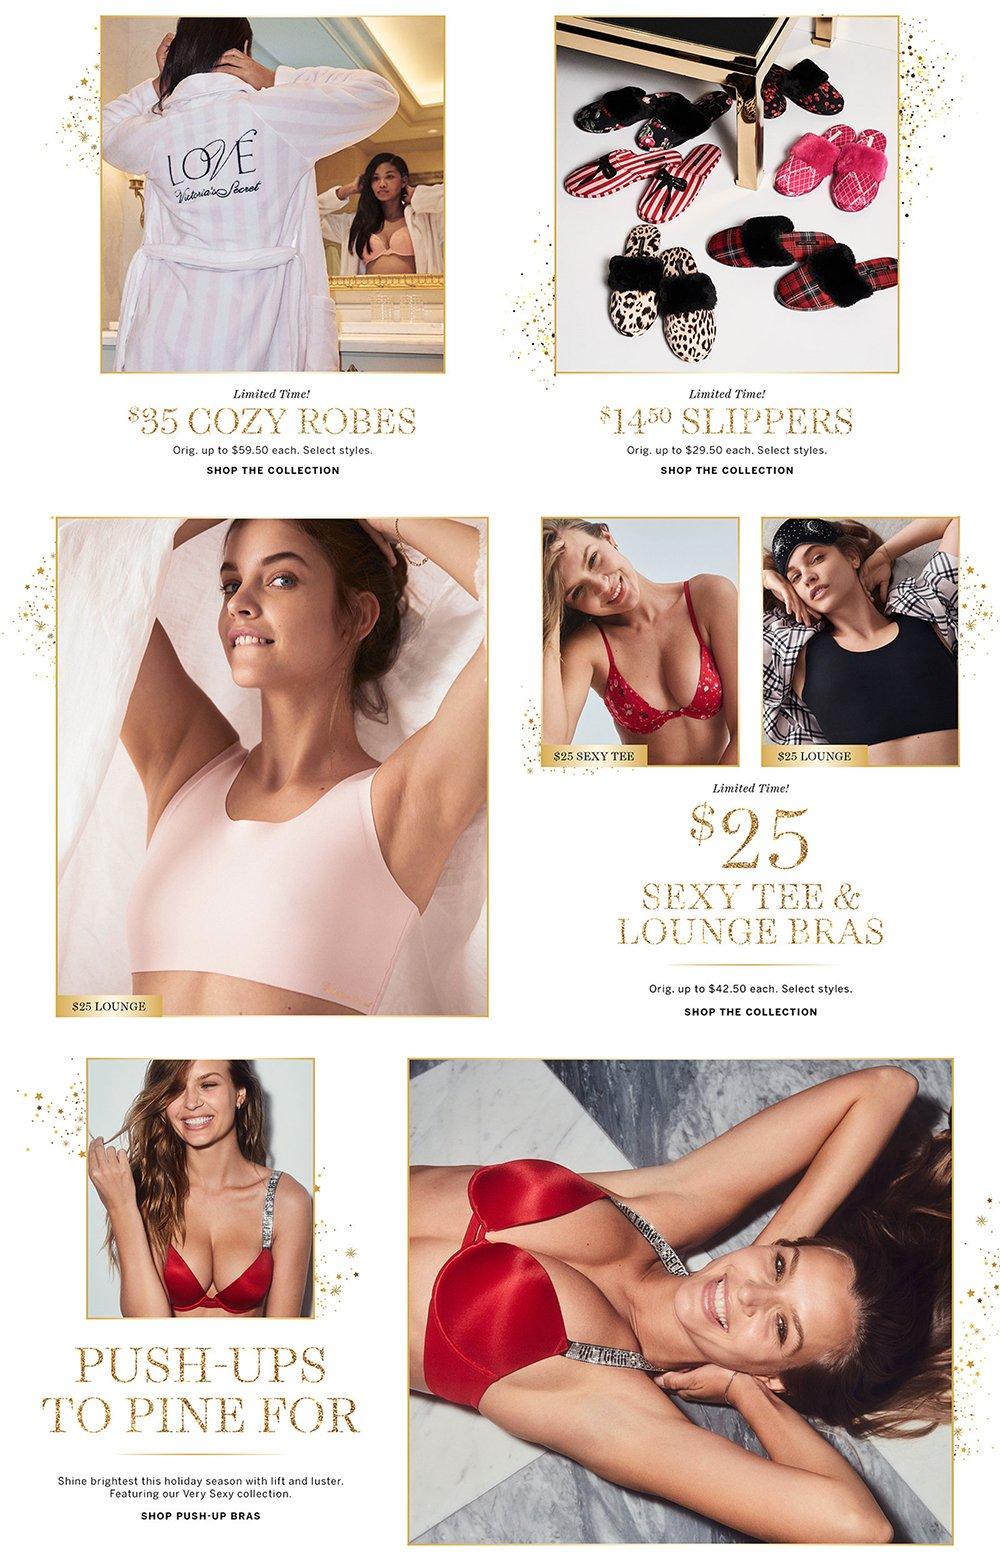 Victoria's Secret Cyber Monday 2020 Page 2